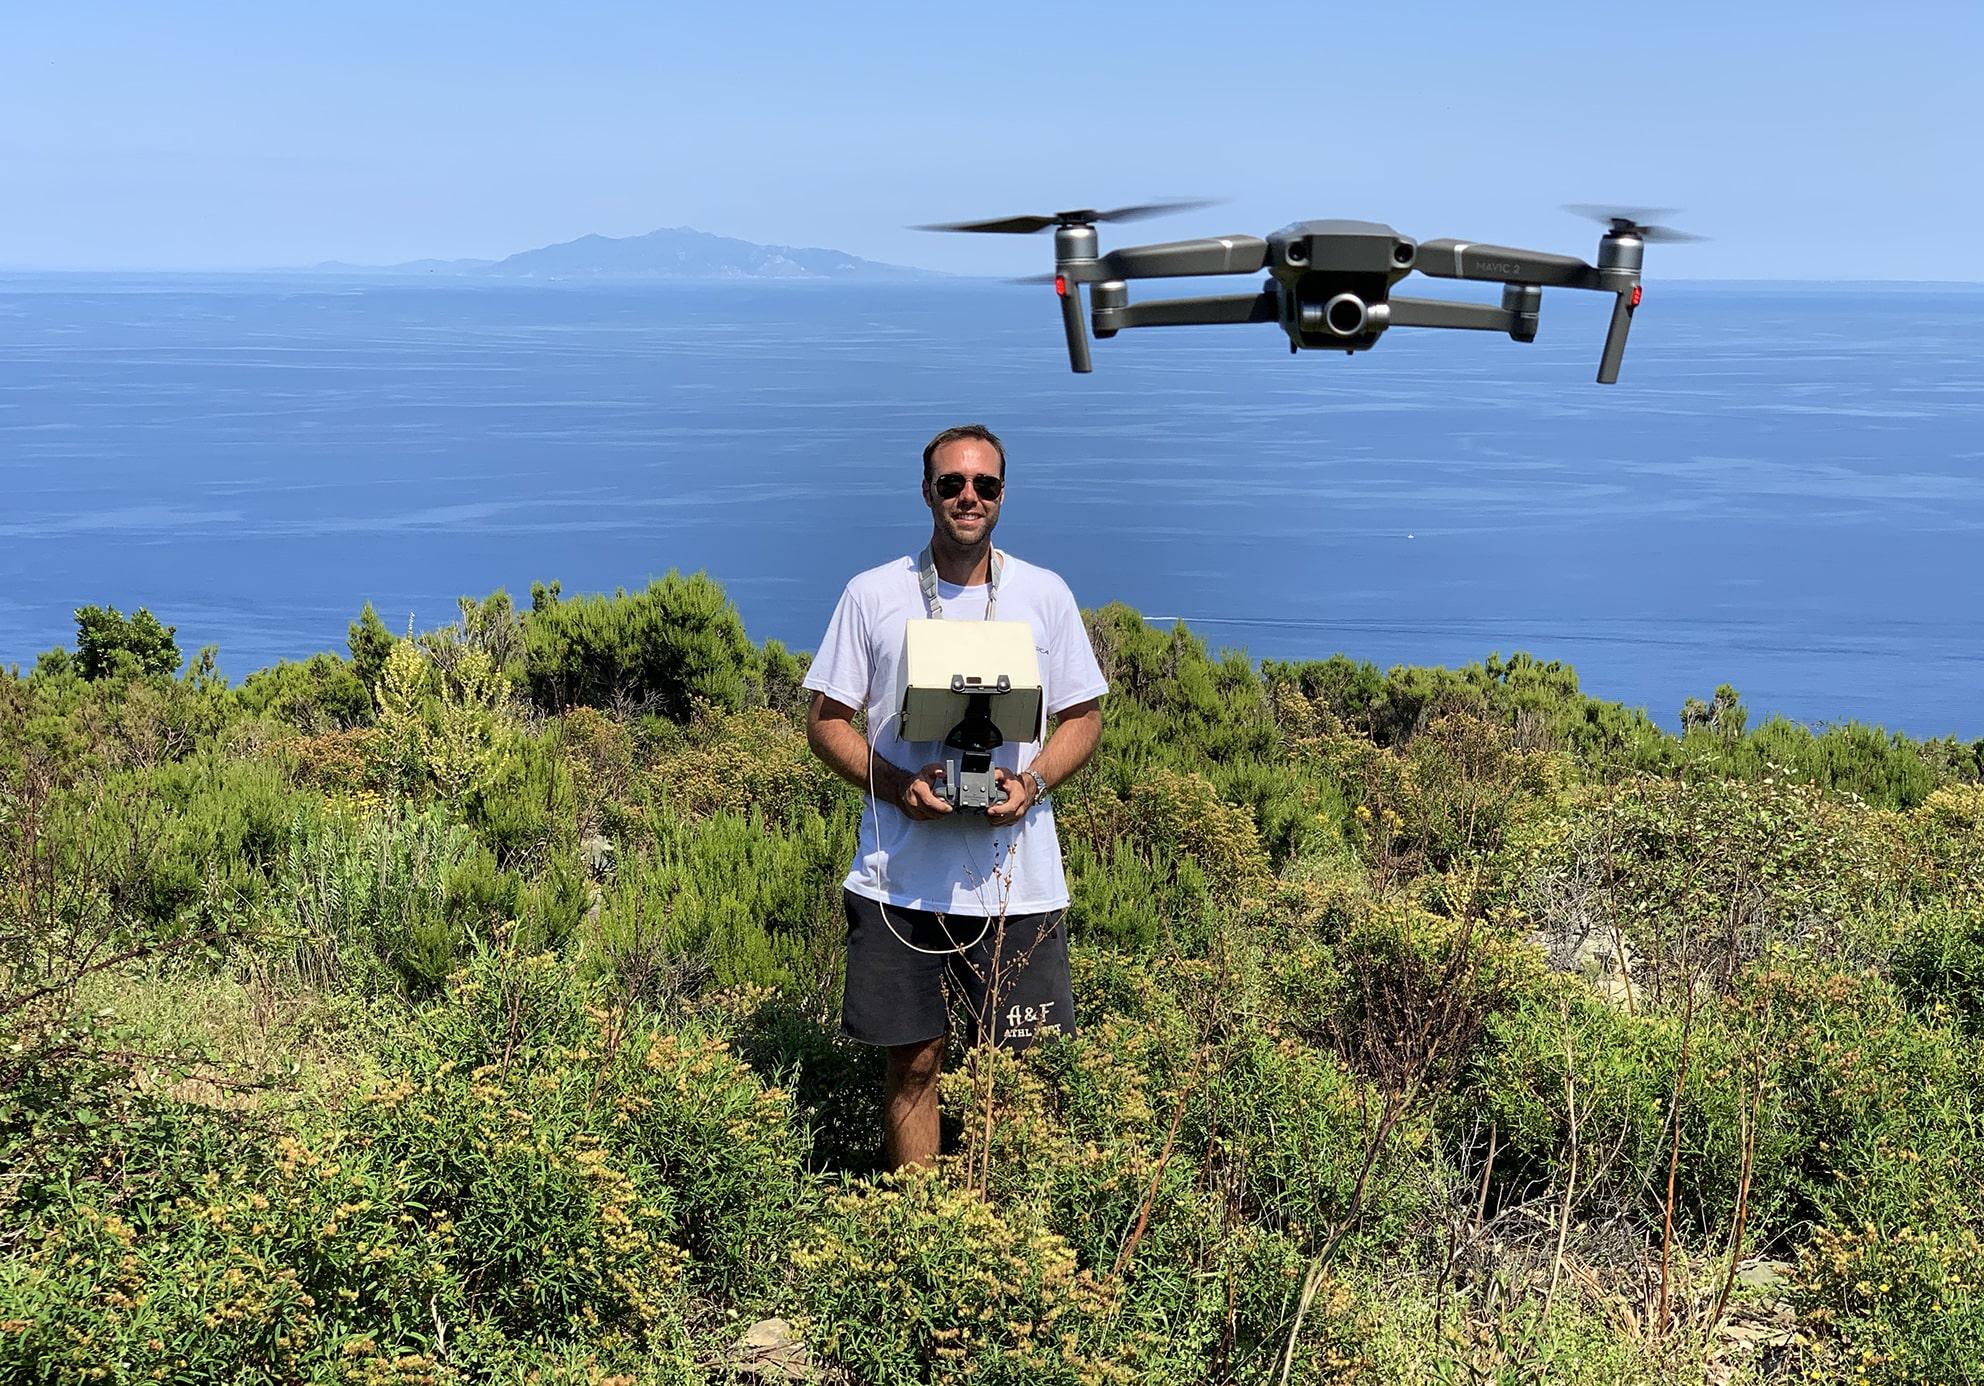 formation-drone-Corse-Juin-20-client-Yoann-min